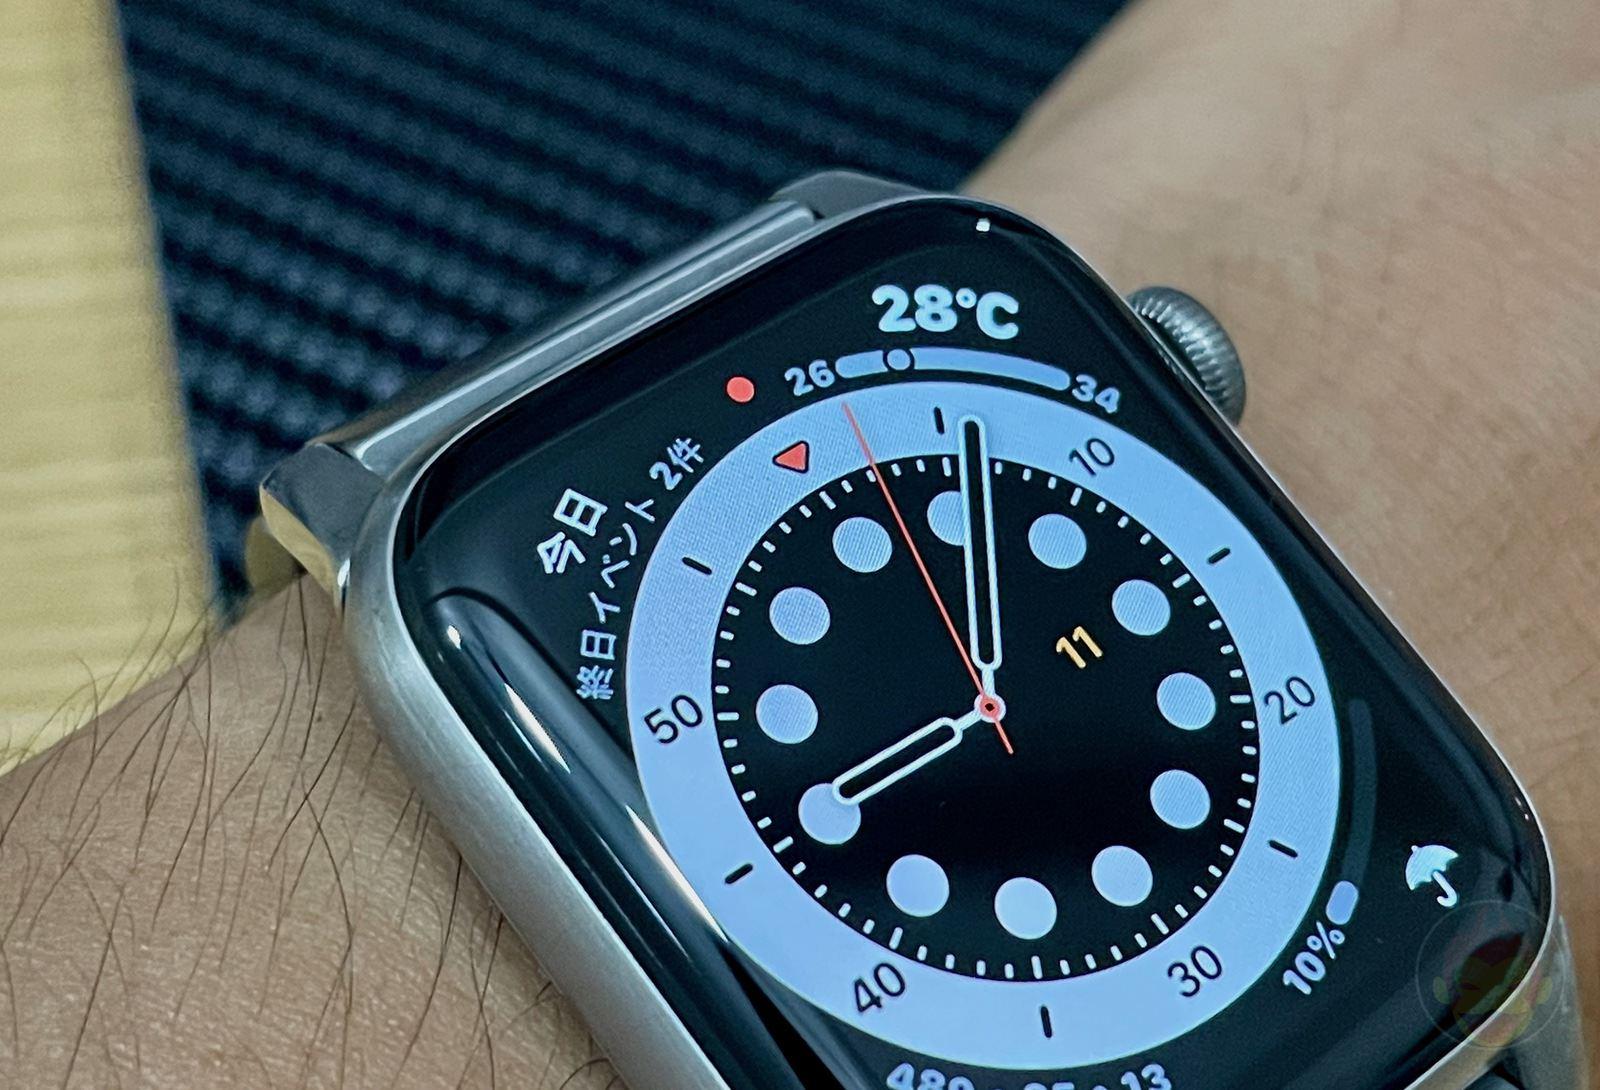 How I use my Apple Watch 02